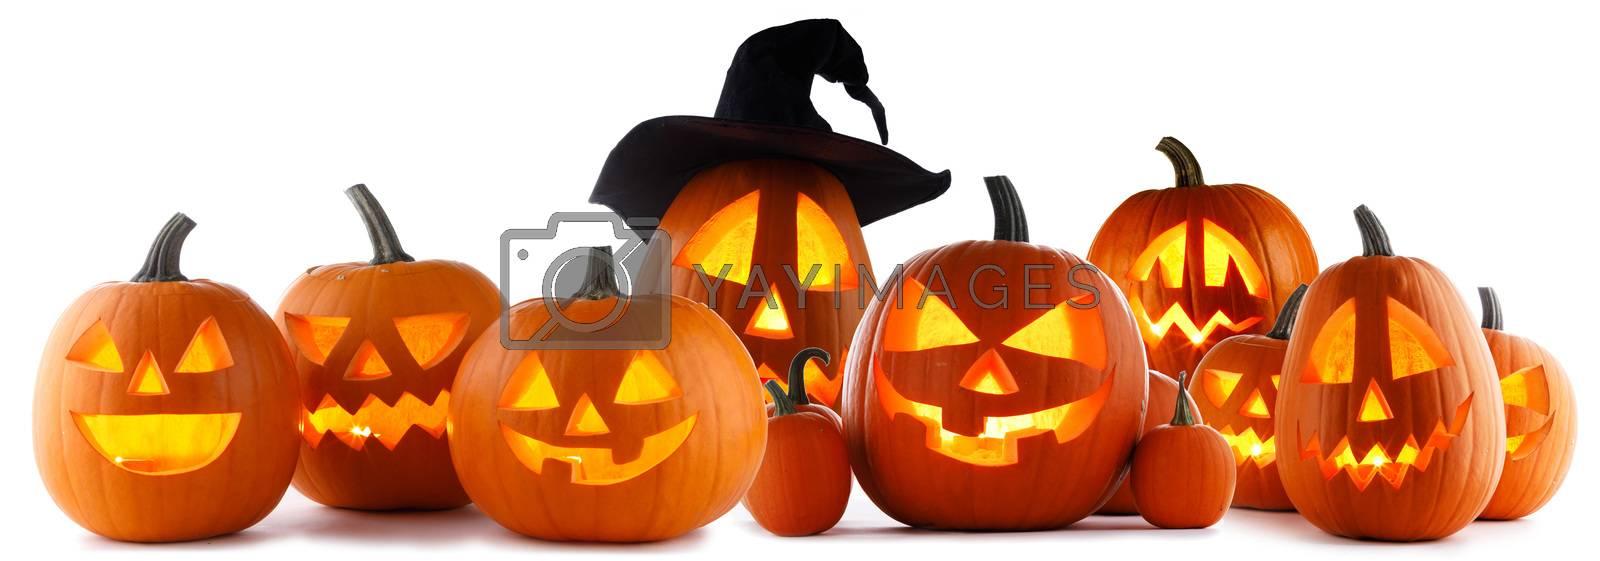 Jack O Lantern Halloween pumpkins by Yellowj